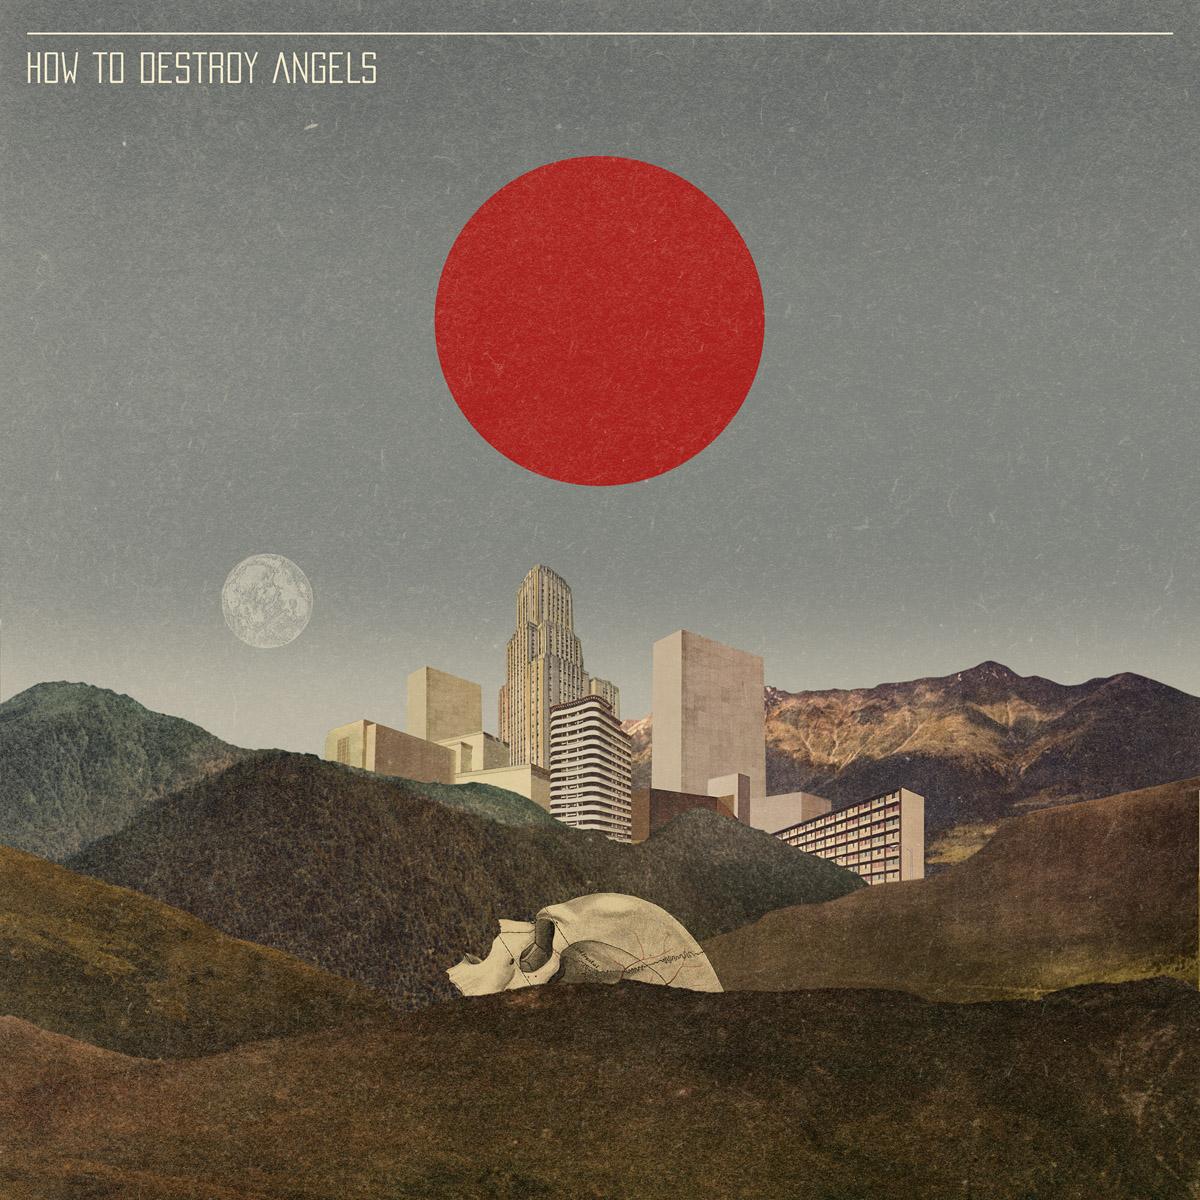 How to Destroy Angels - EP - Digital Cover Art.jpg